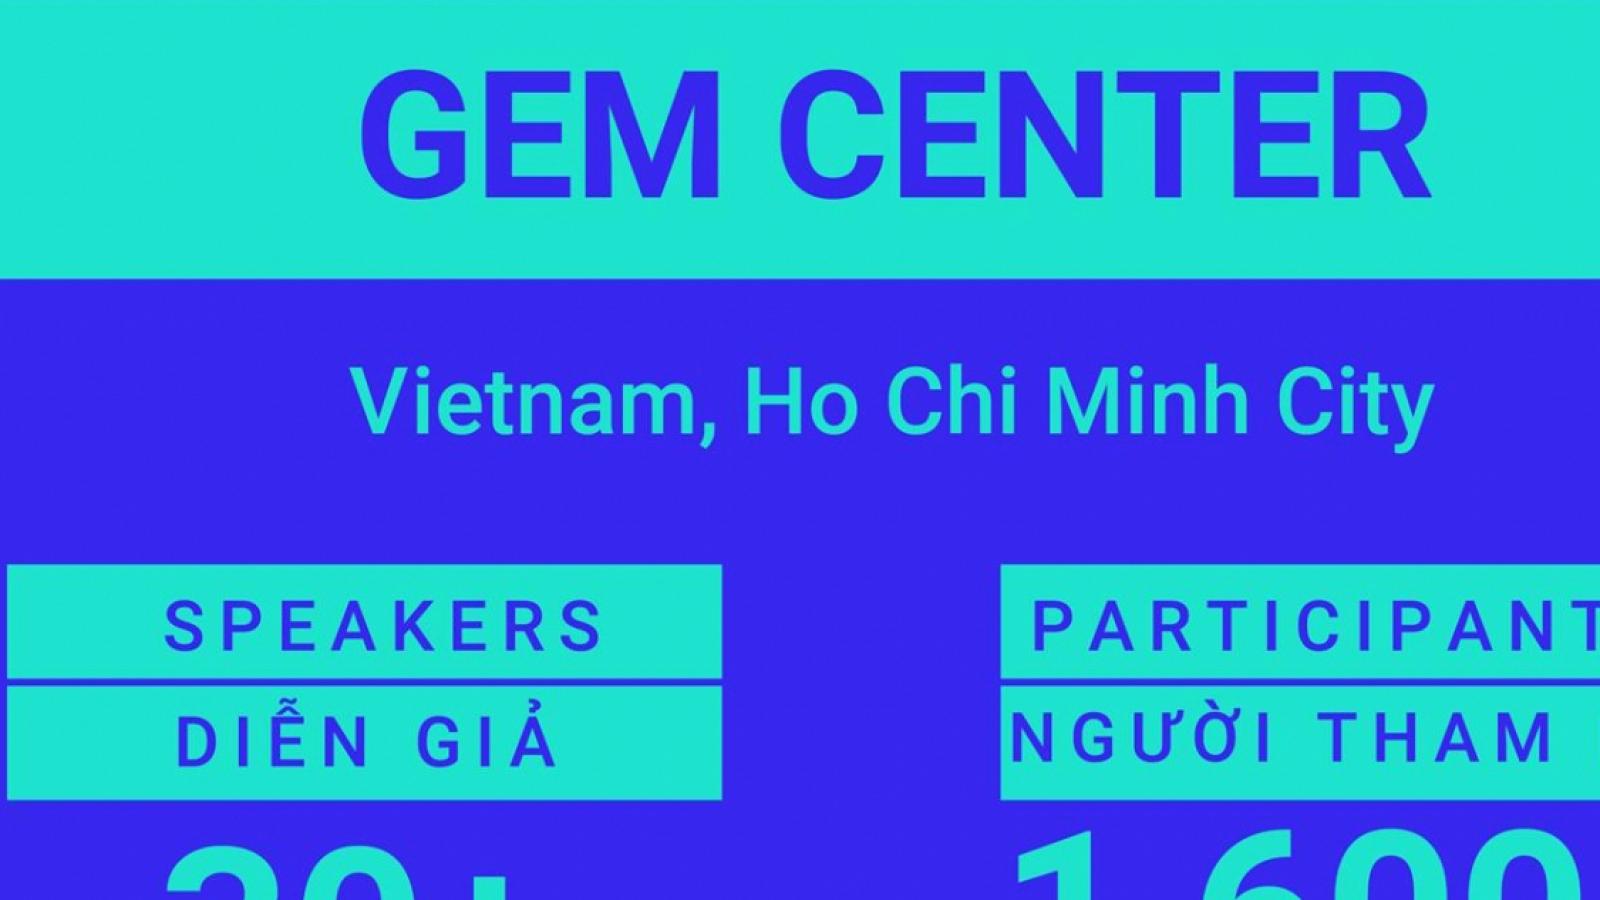 Blockchain Festival Vietnam 2018 kicks off next week